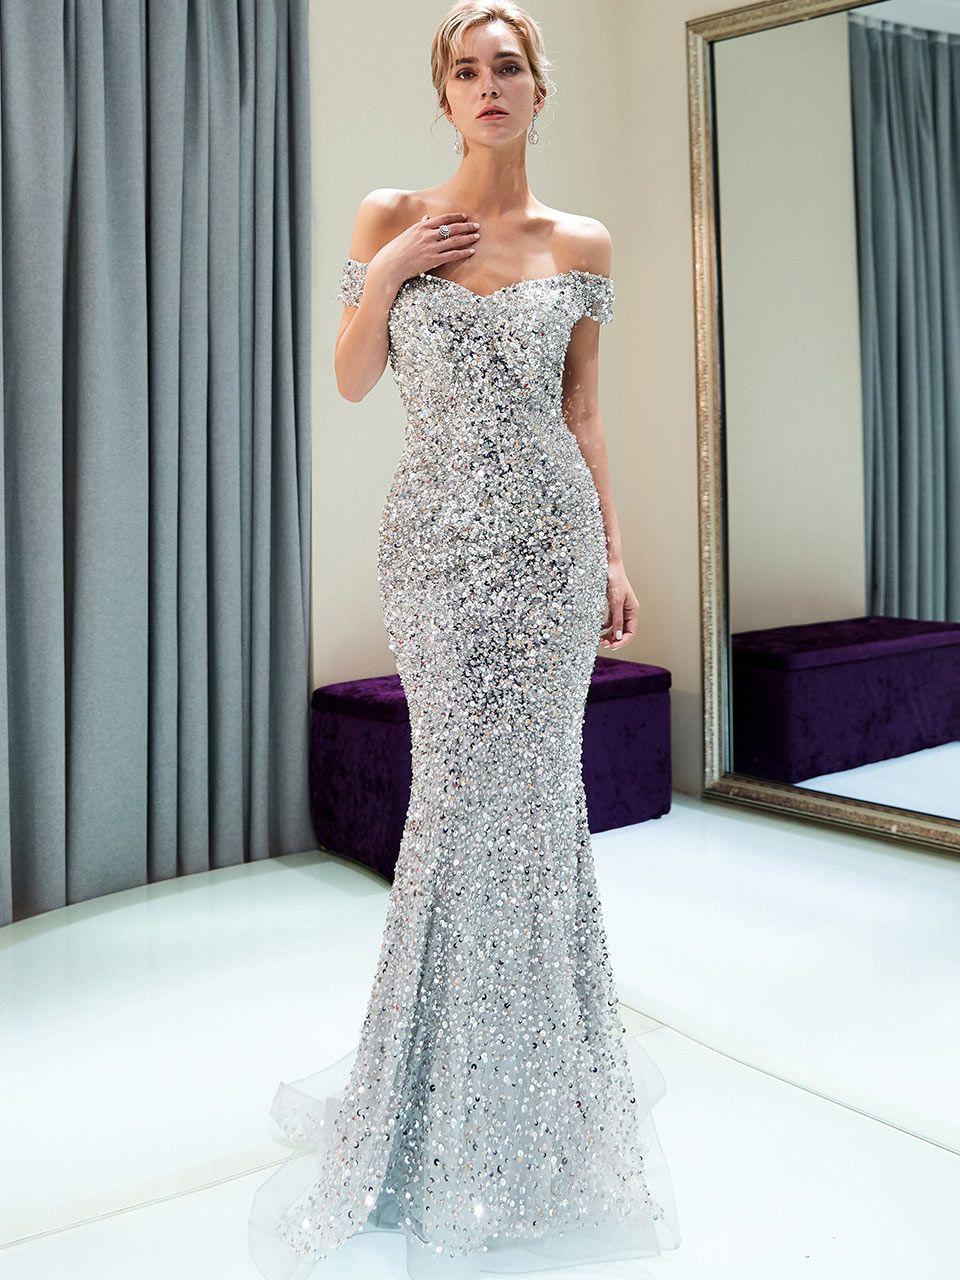 Best wedding dresses for full bust  silver mermaid prom dressessequin mermaid prom dressesbeaded prom